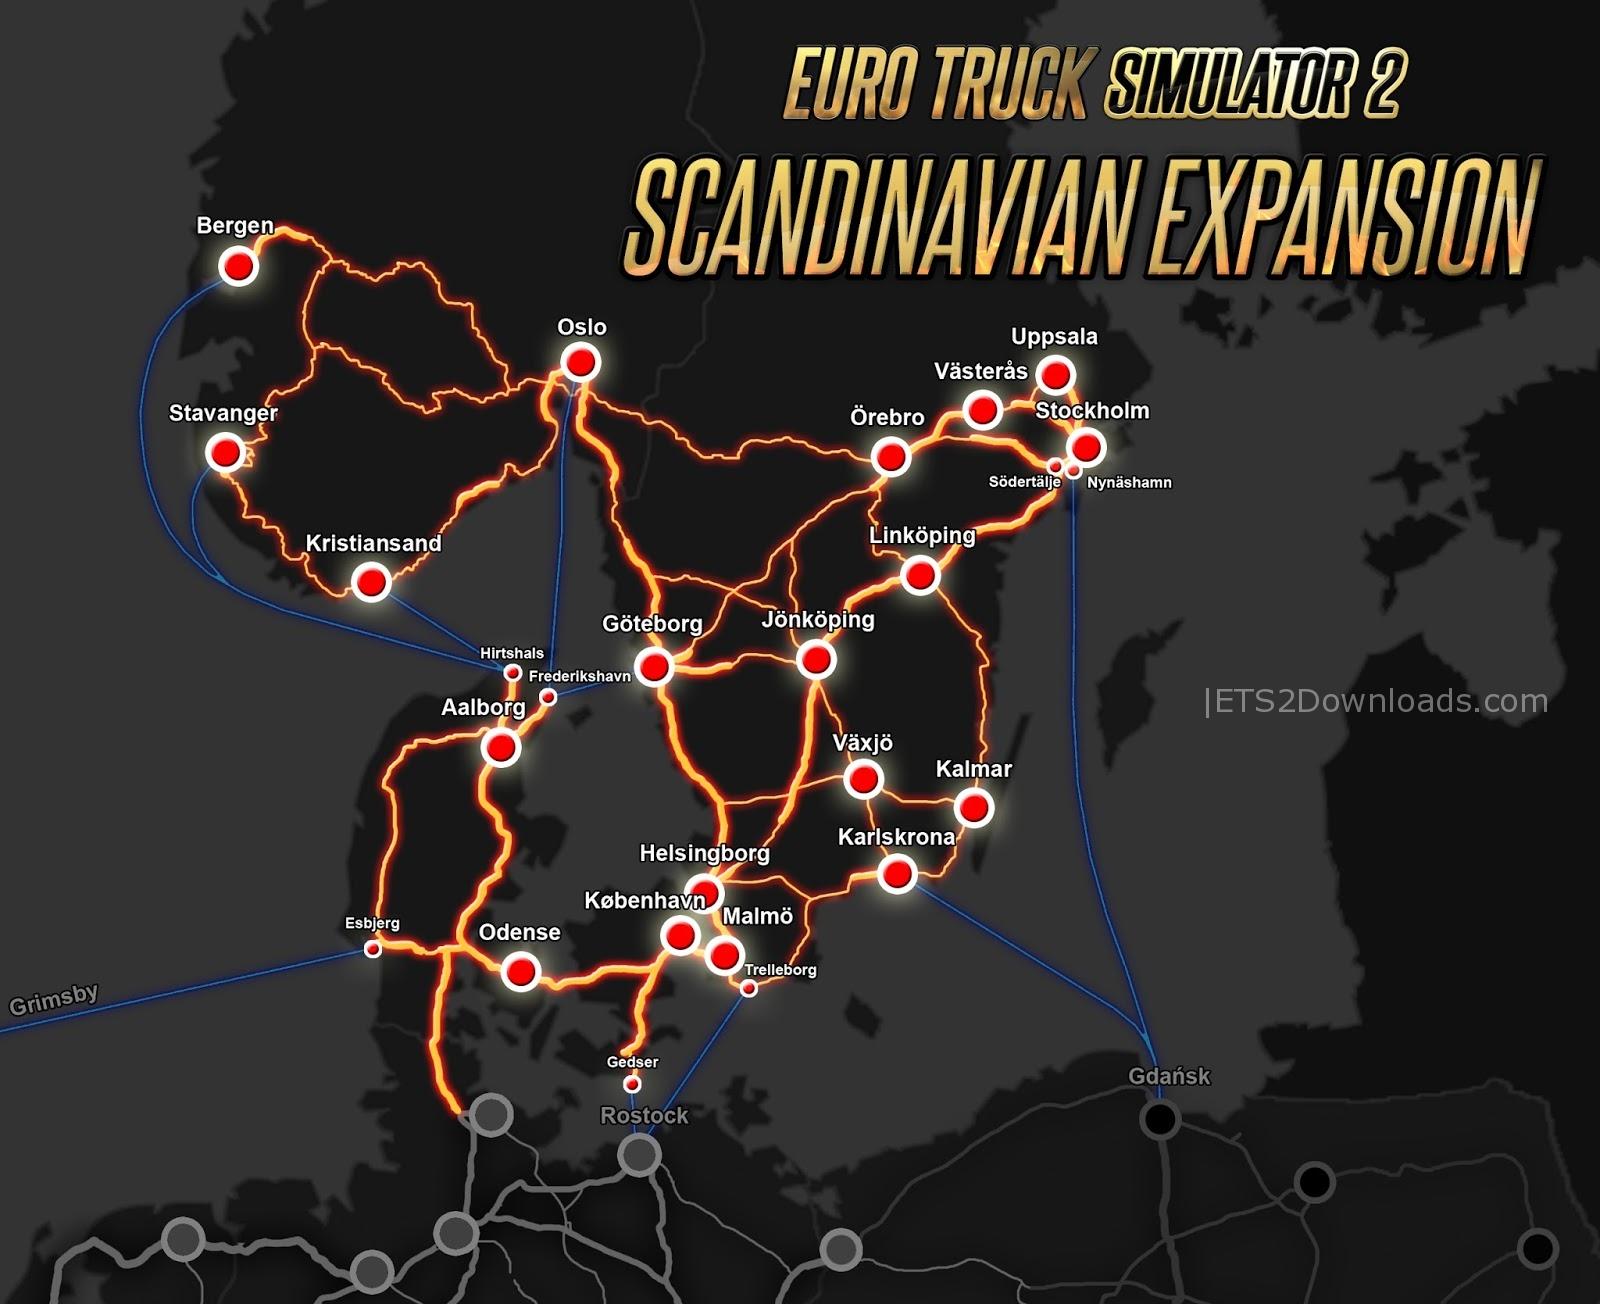 scandinavia-ets2